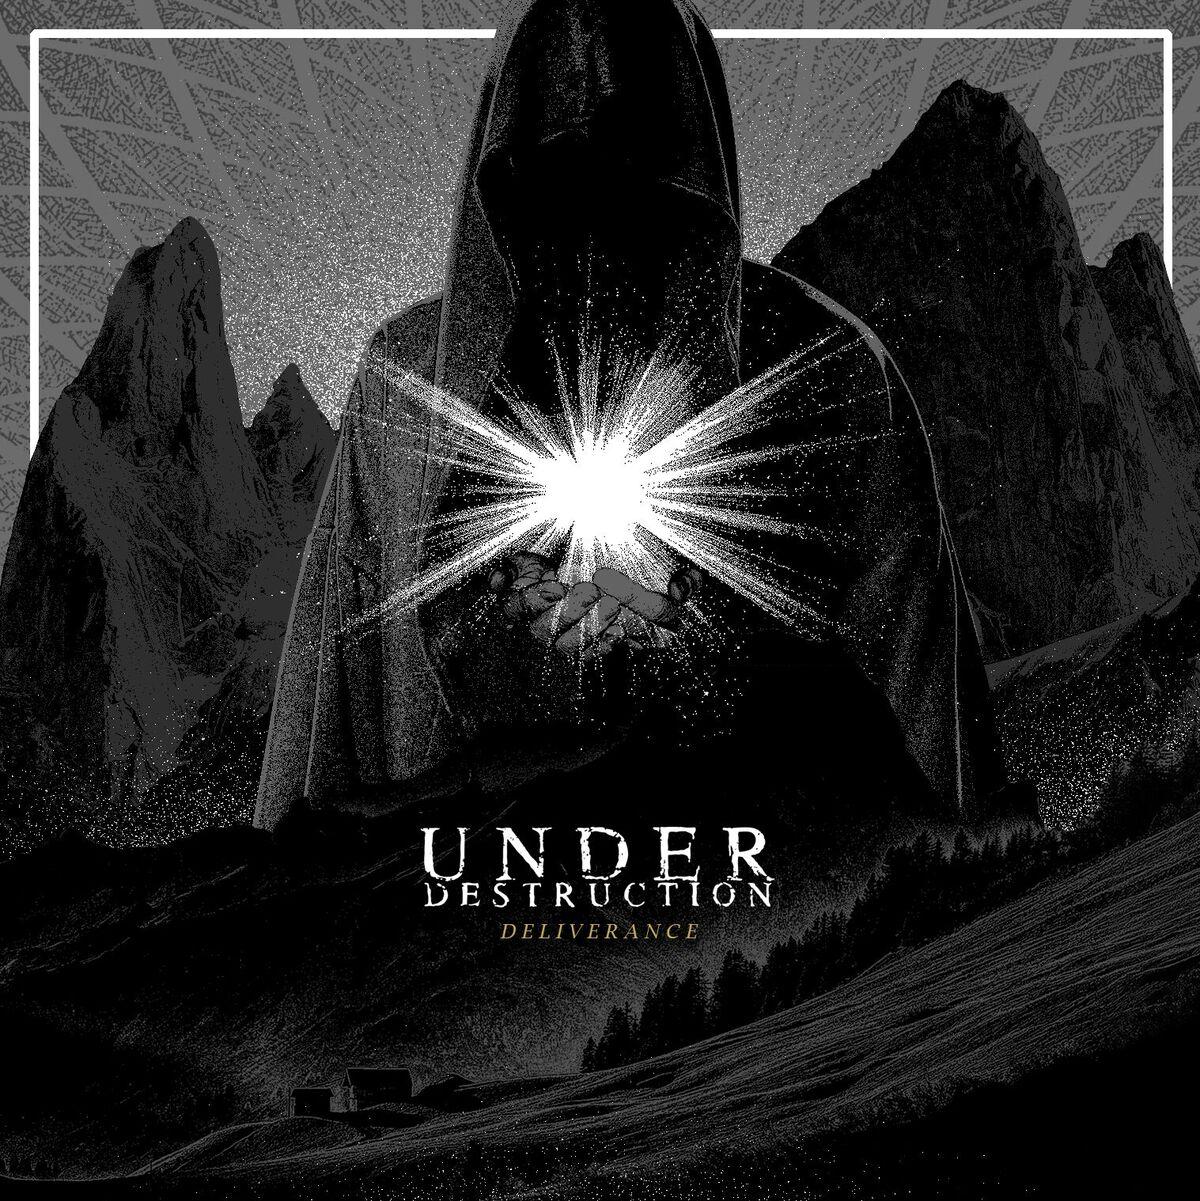 under-destruction-deliverance-kino-fuer-die-ohren-cd-review